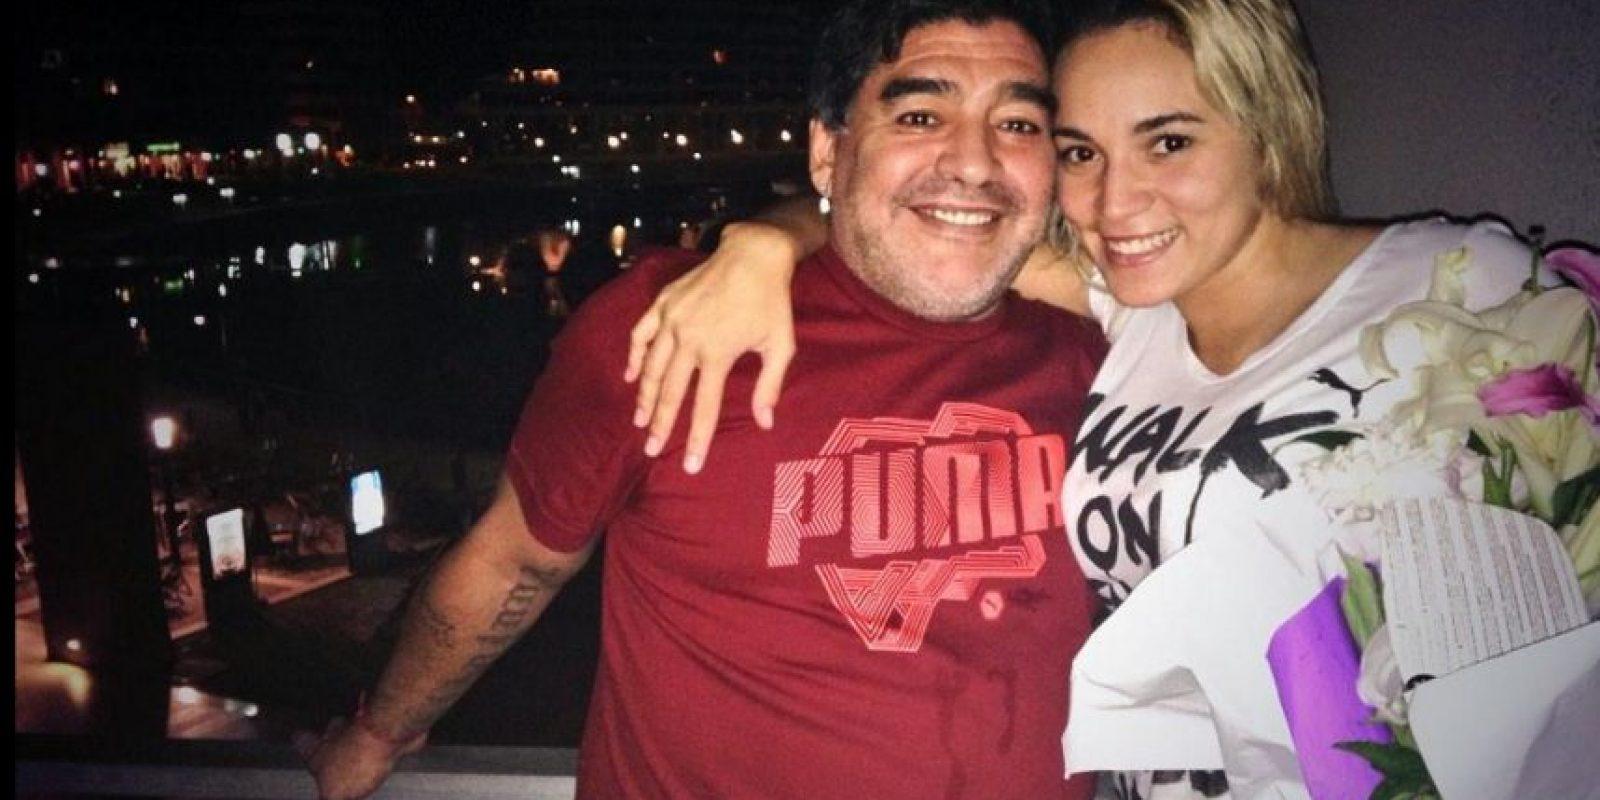 Diego Maradona y Rocío Oliva Foto:Vía twitter.com/rogeraldineoliv